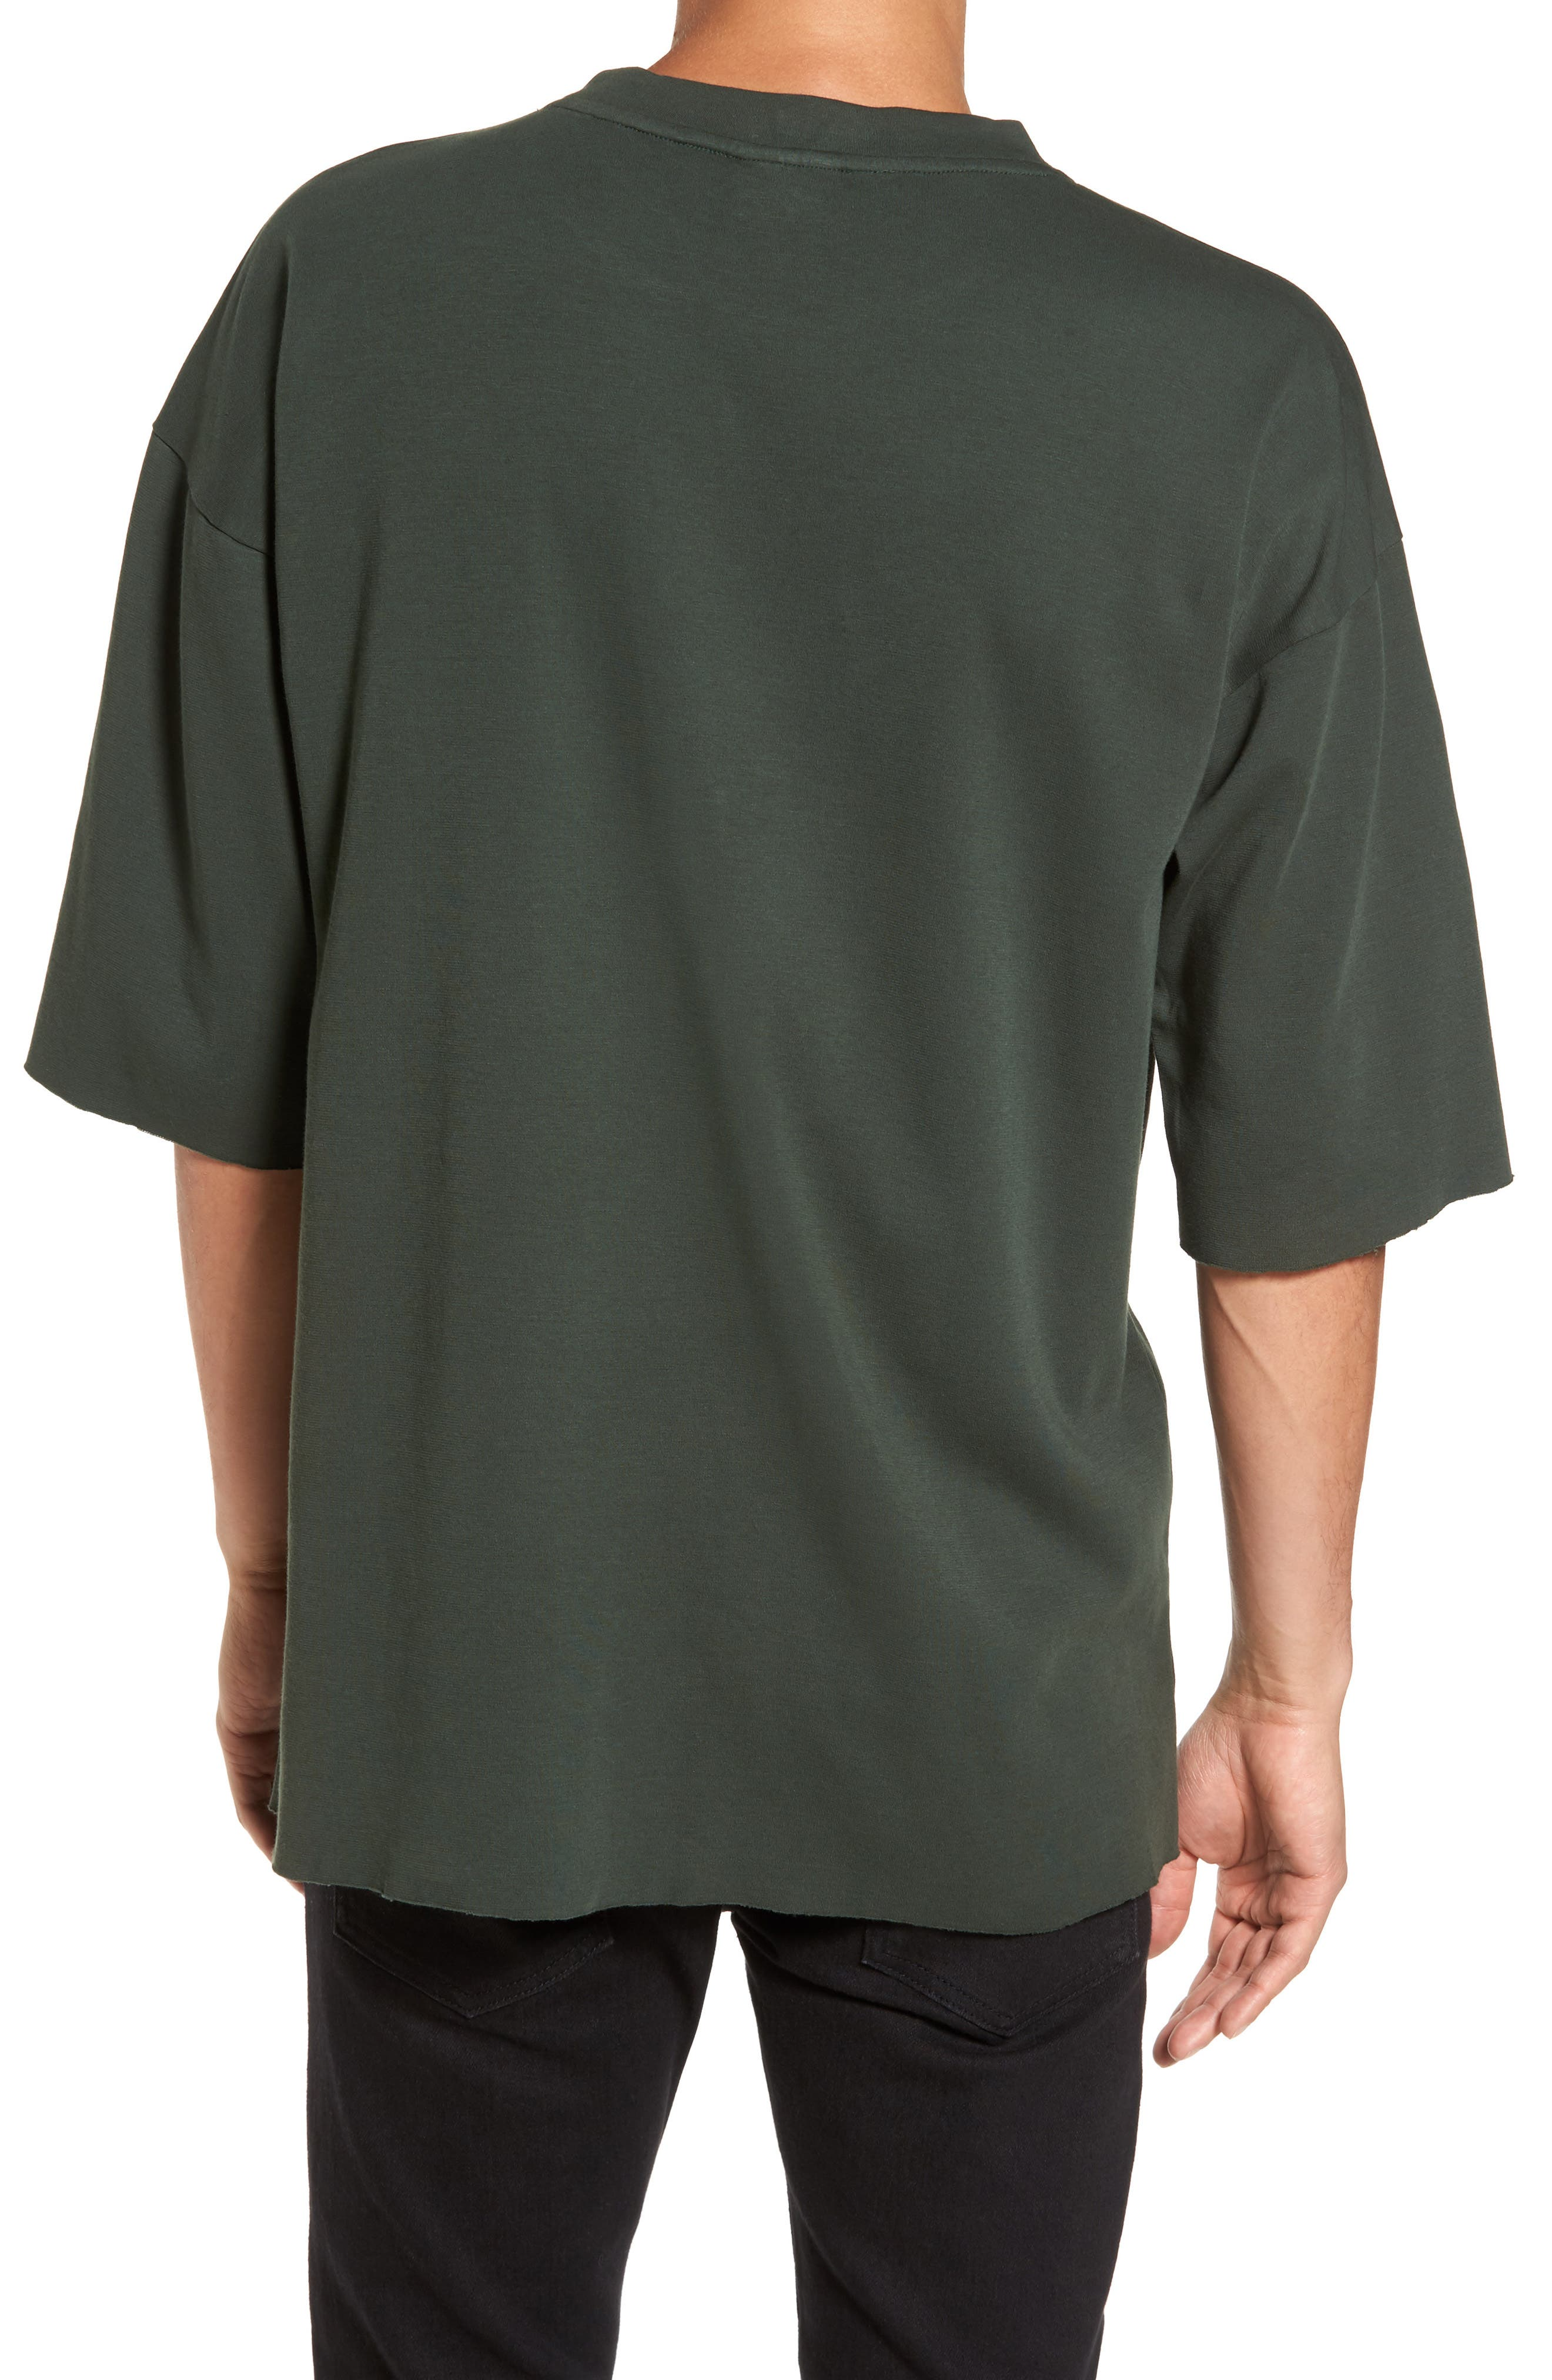 Mauno Pocket T-Shirt,                             Alternate thumbnail 2, color,                             Riot Green